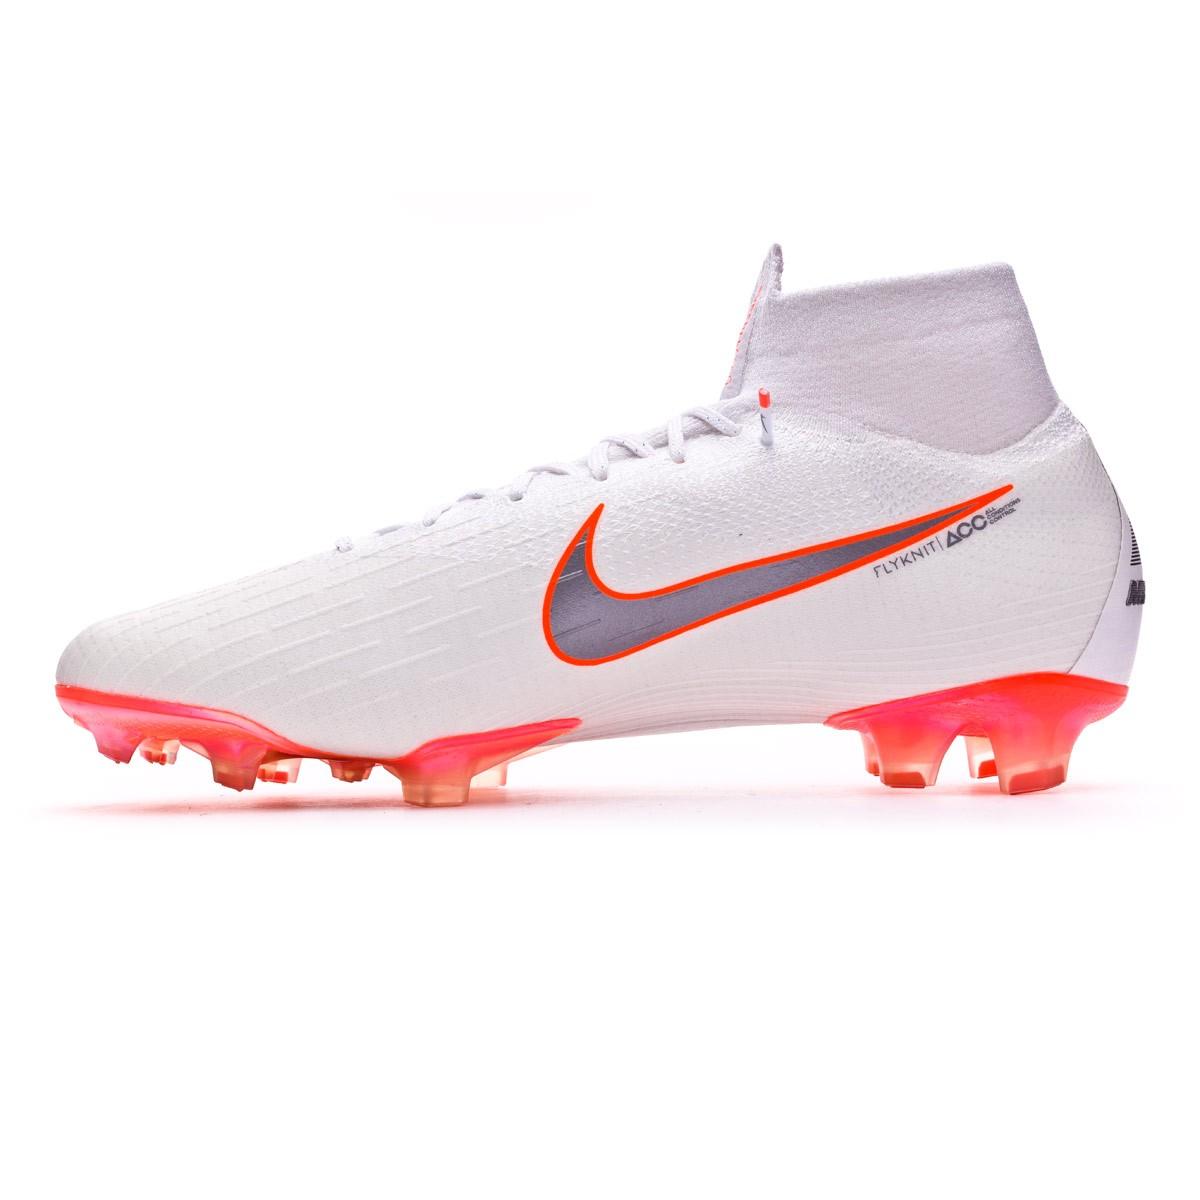 9871ad4c64cc Football Boots Nike Mercurial Superfly VI Elite FG White-Metallic cool  grey-Total orange - Tienda de fútbol Fútbol Emotion